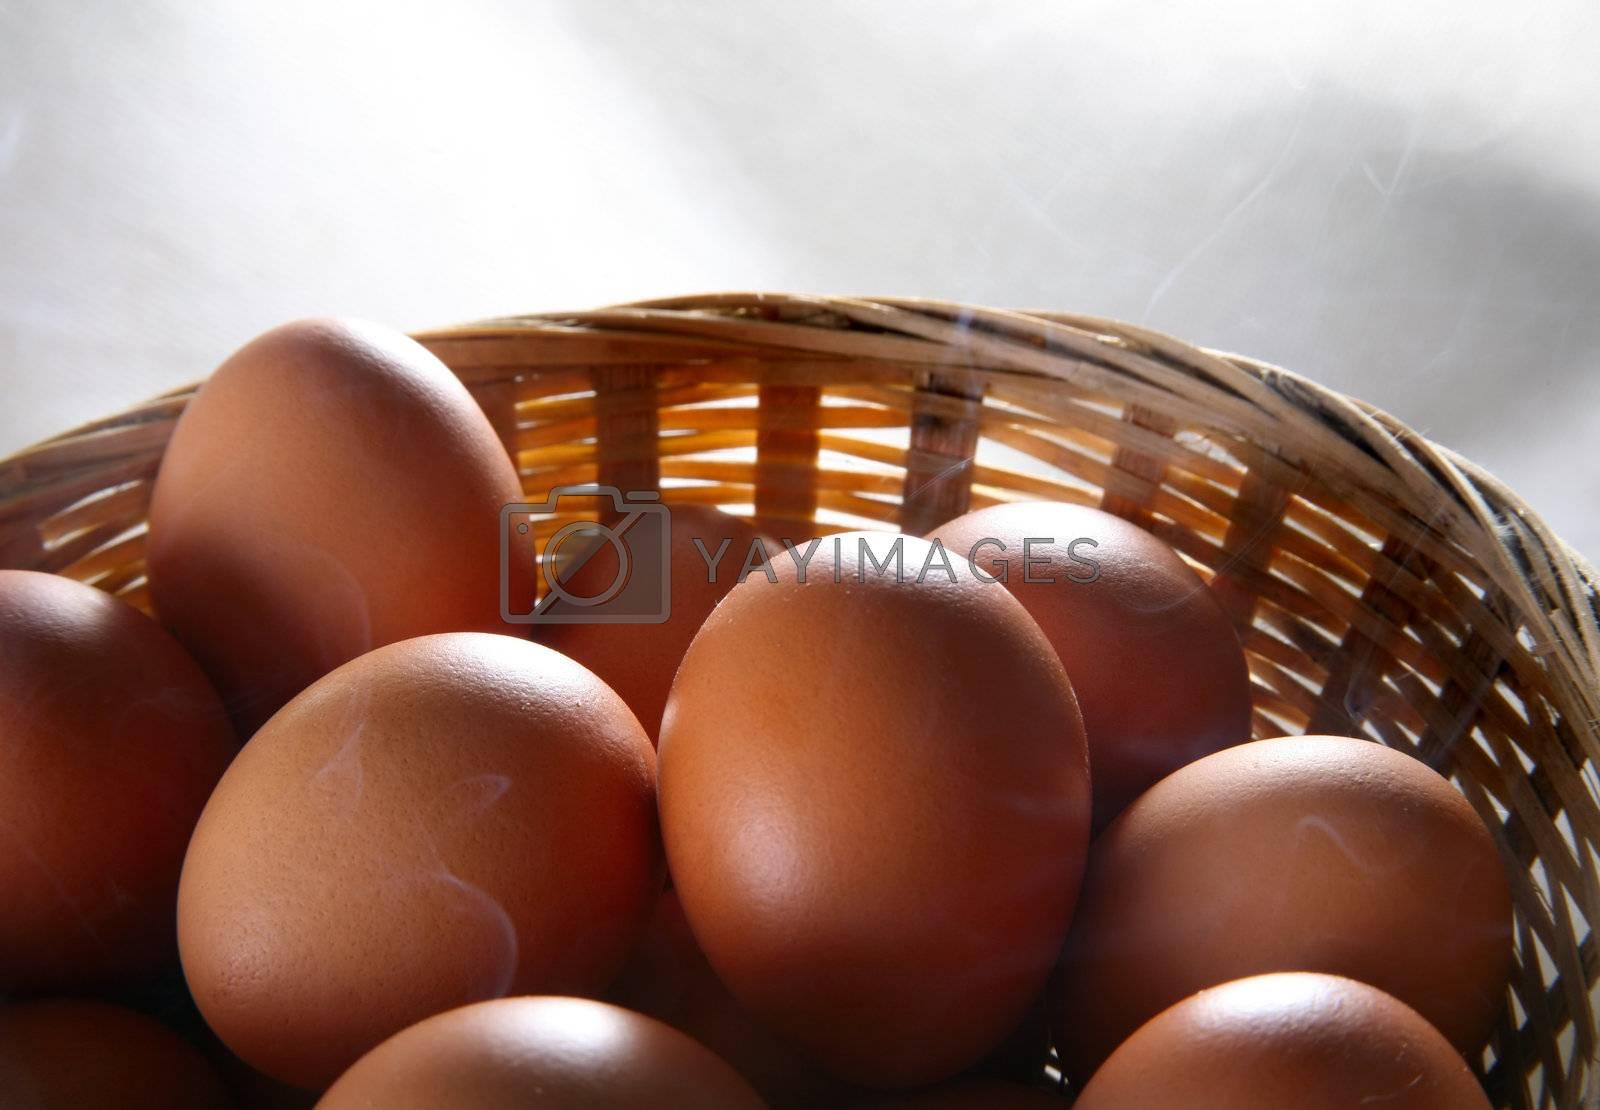 Eggs in a basket in smokie